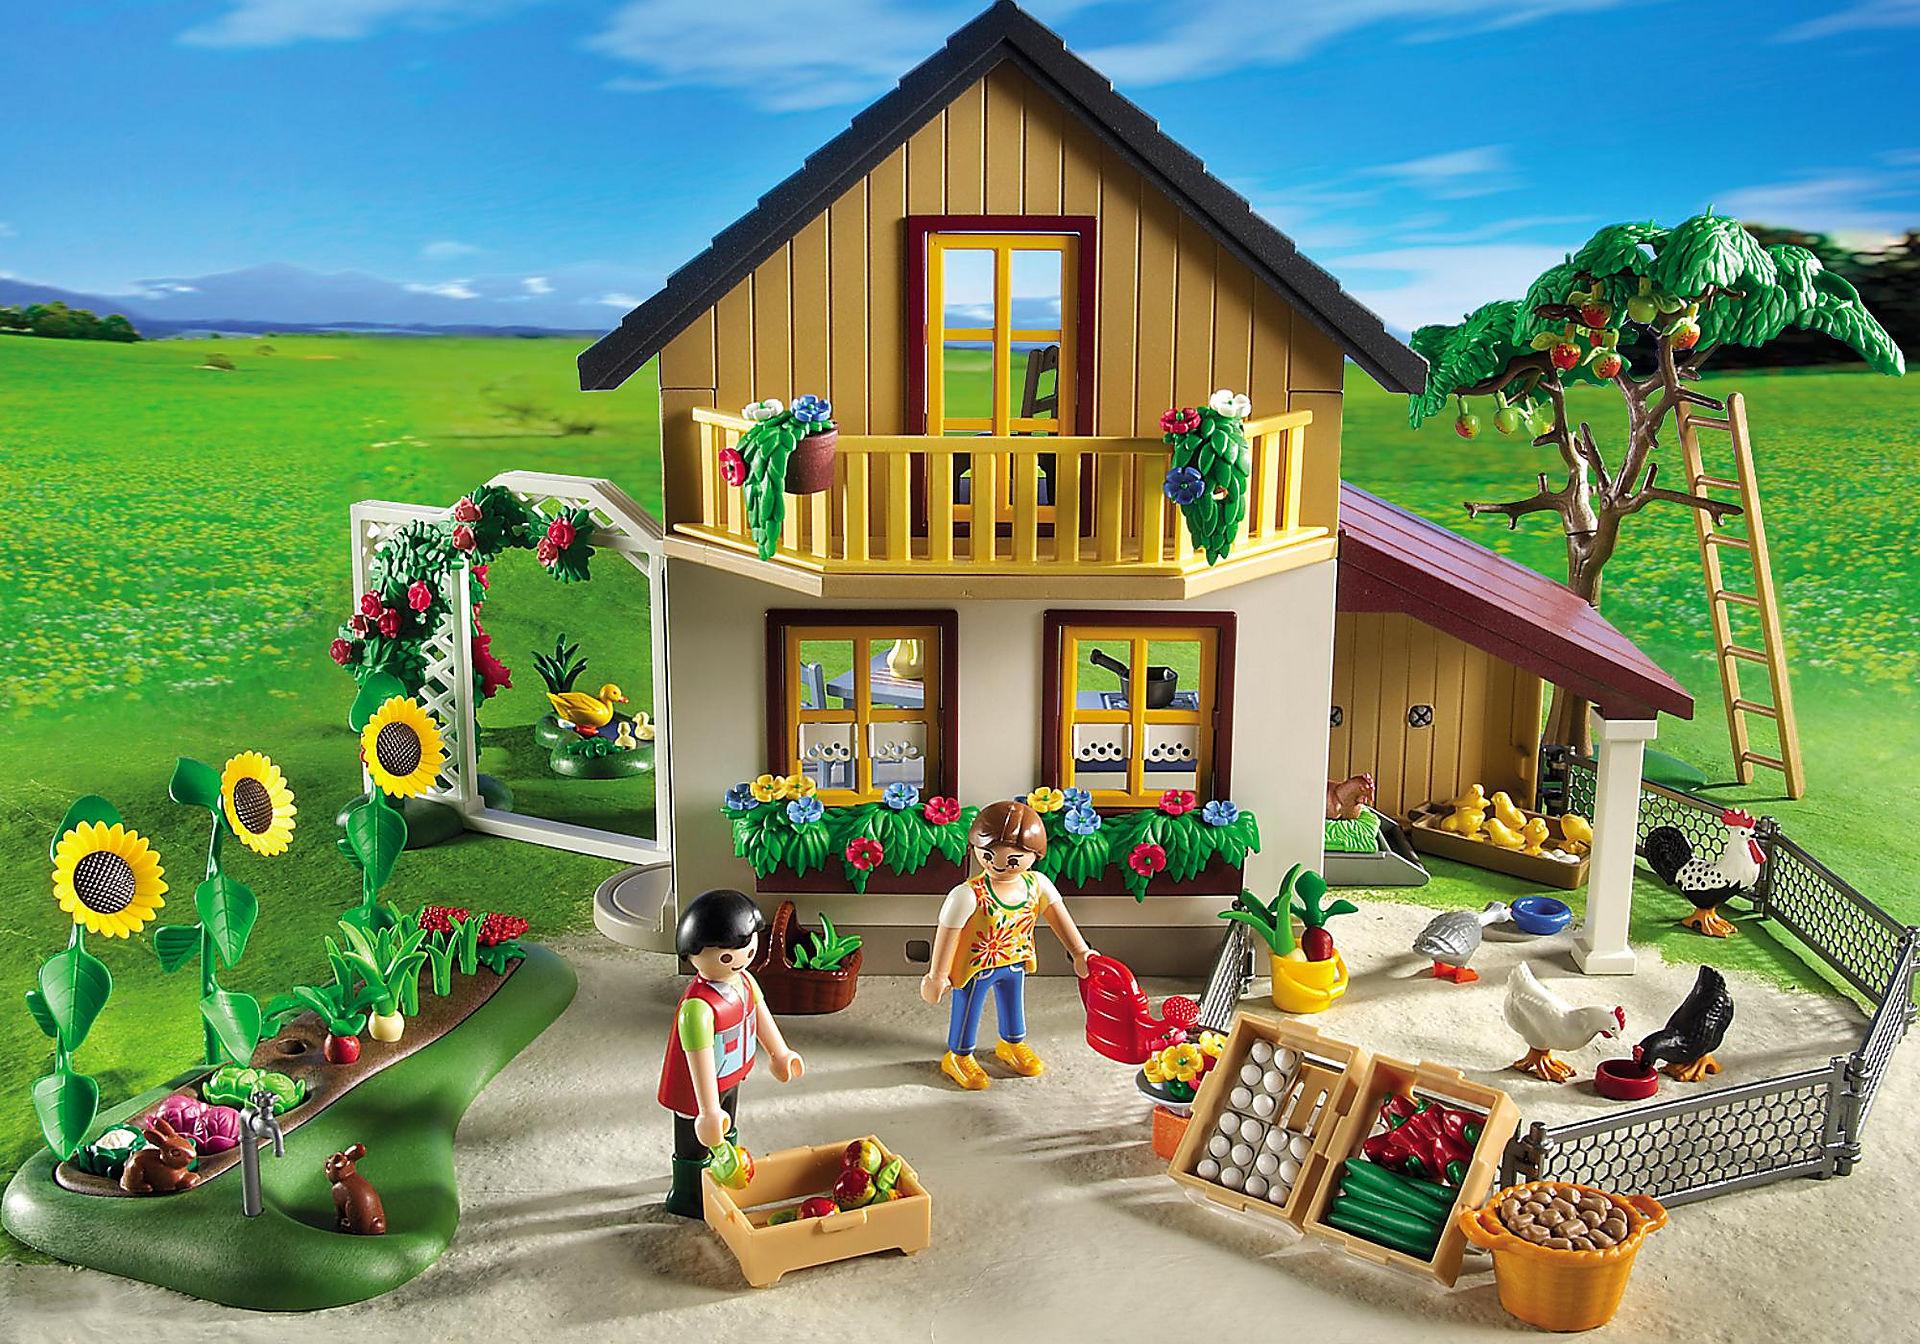 http://media.playmobil.com/i/playmobil/5120_product_extra5/Bauernhaus mit Hofladen